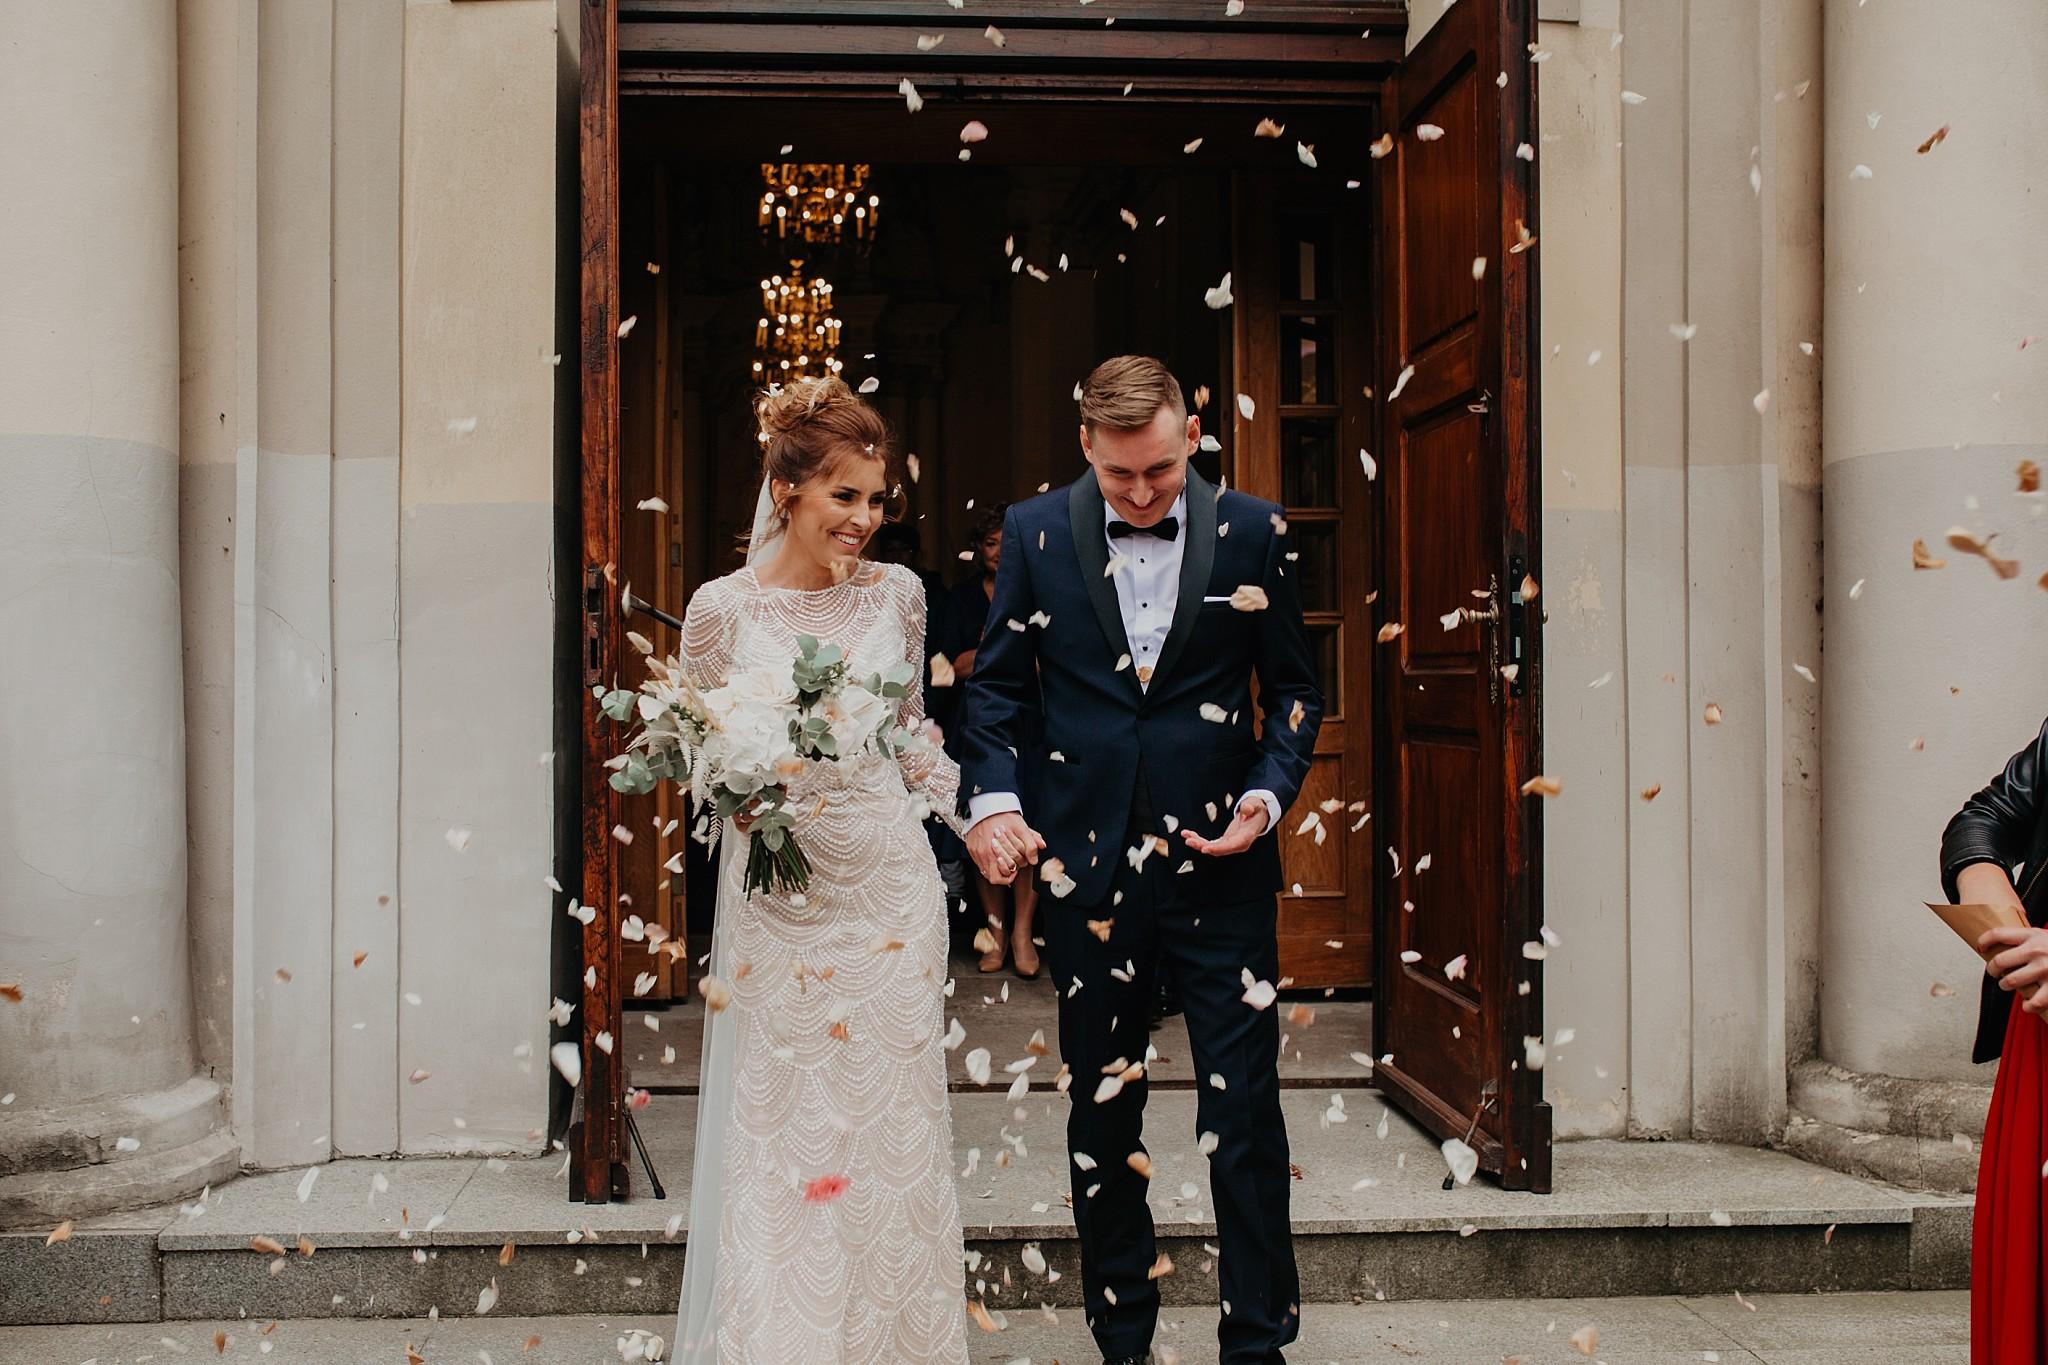 fotograf poznan wesele dobra truskawka piekne wesele pod poznaniem wesele w dobrej truskawce piekna para mloda slub marzen slub koronawirus slub listopad wesele koronawirus 219